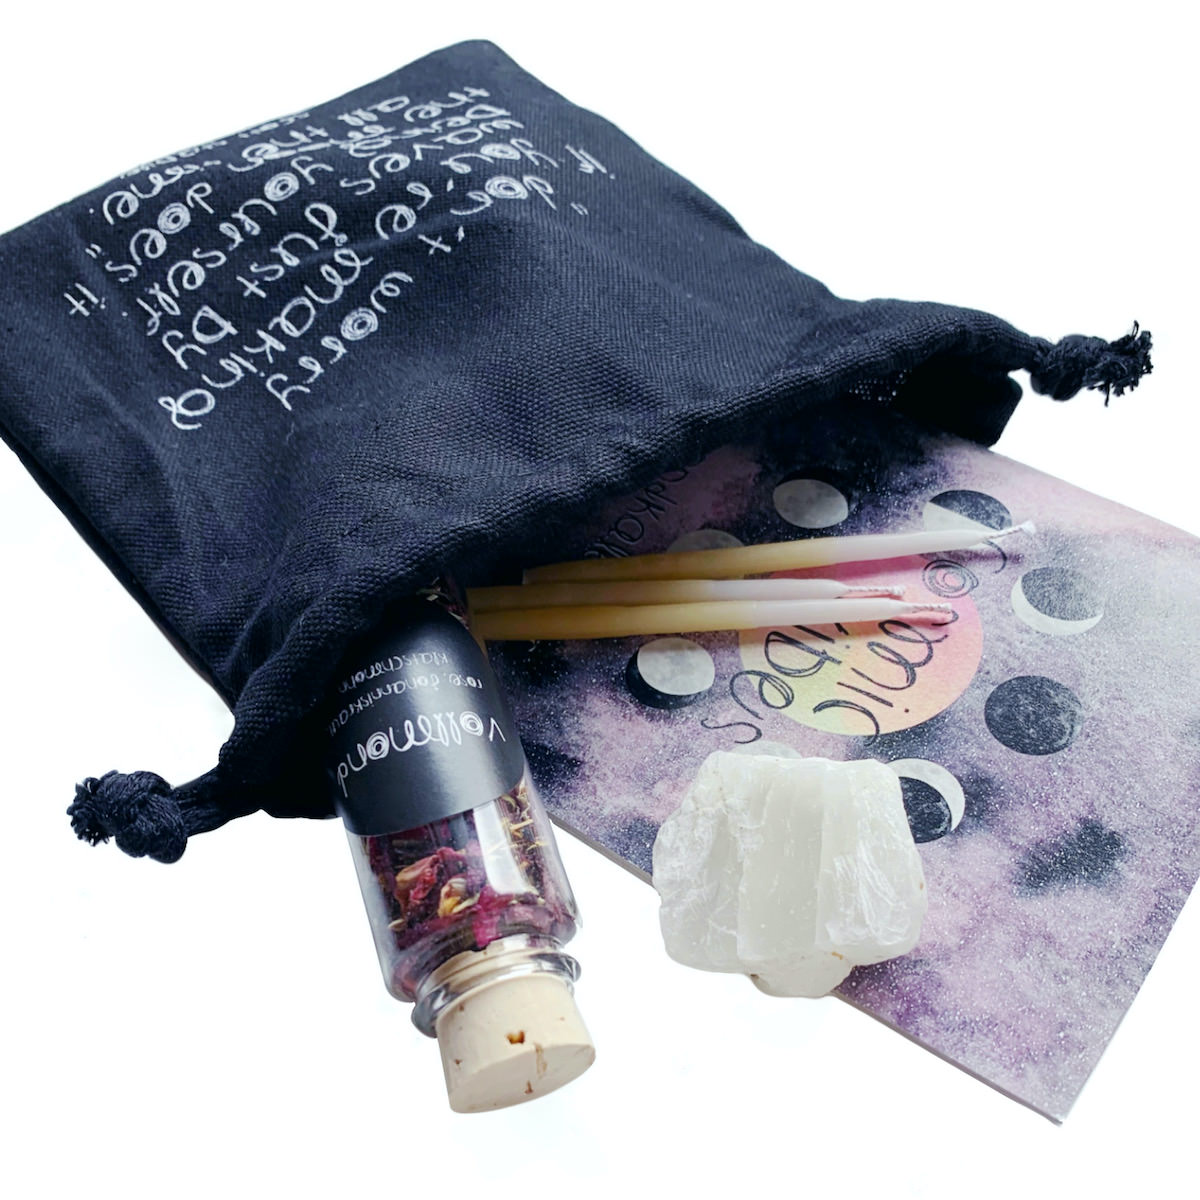 Cosmic Vibes Vollmond Ritual Kit mit Mondkalender